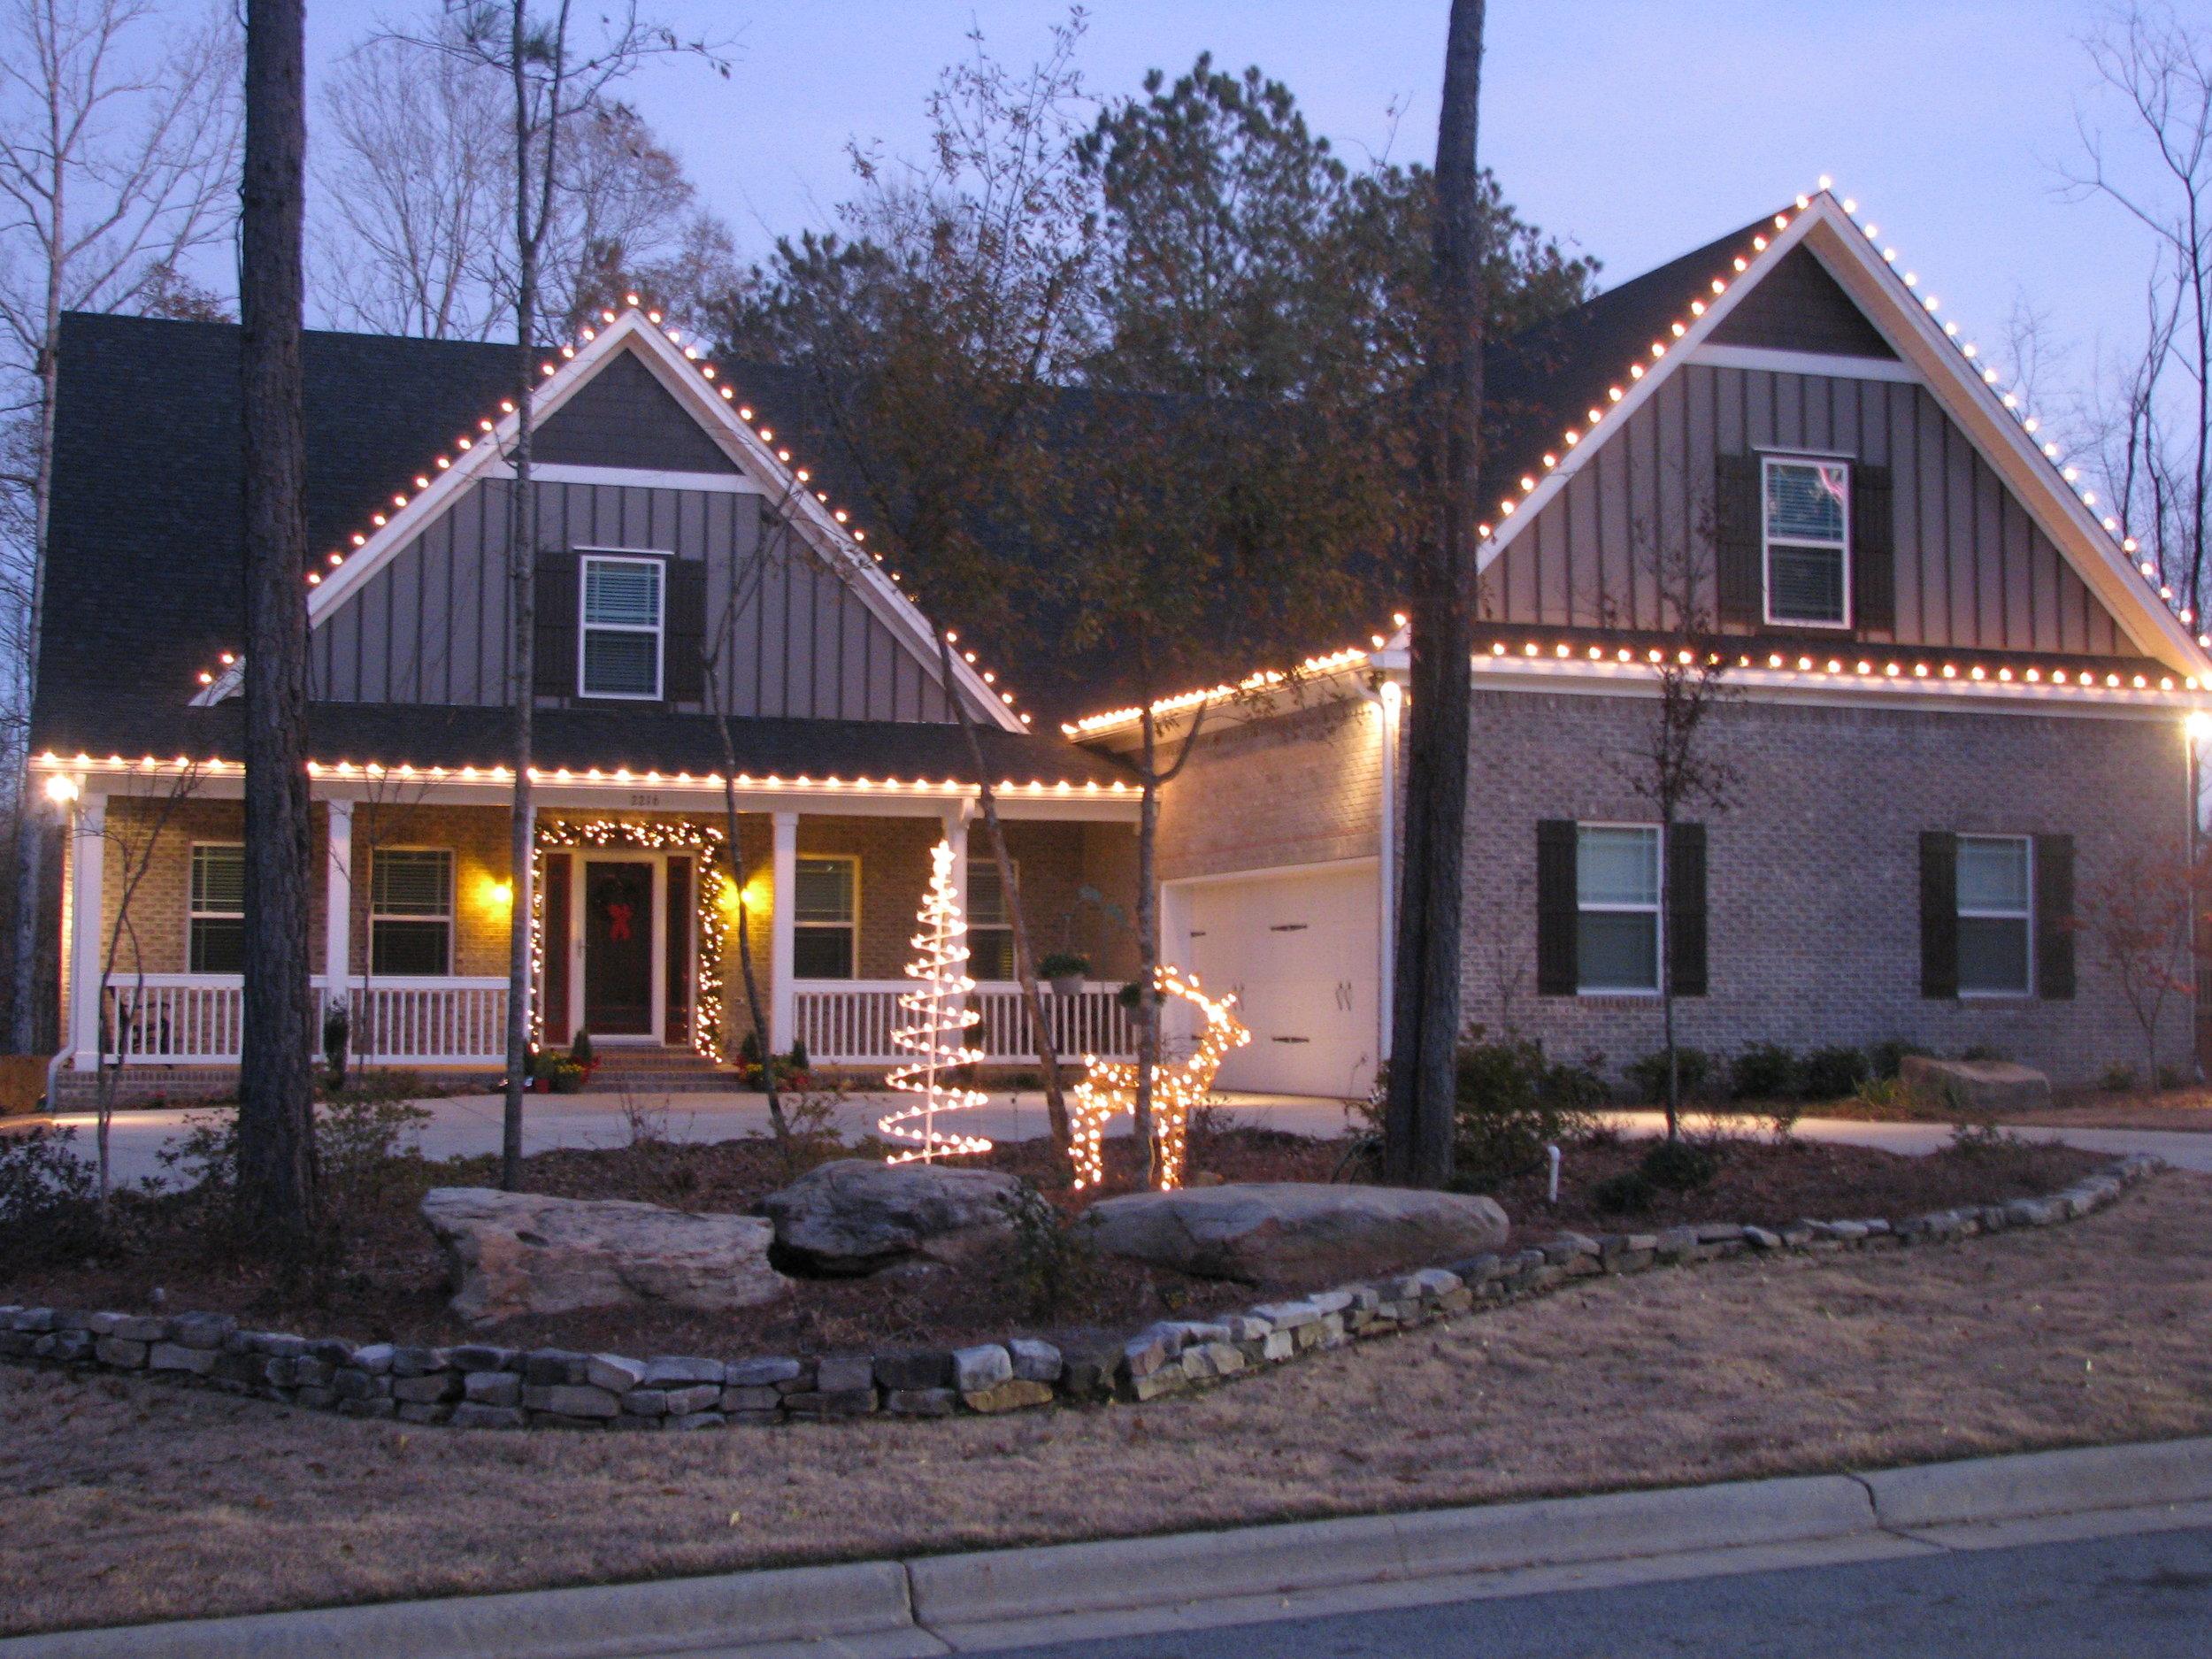 glitter and glow chrismas decor residential exterior (18).JPG